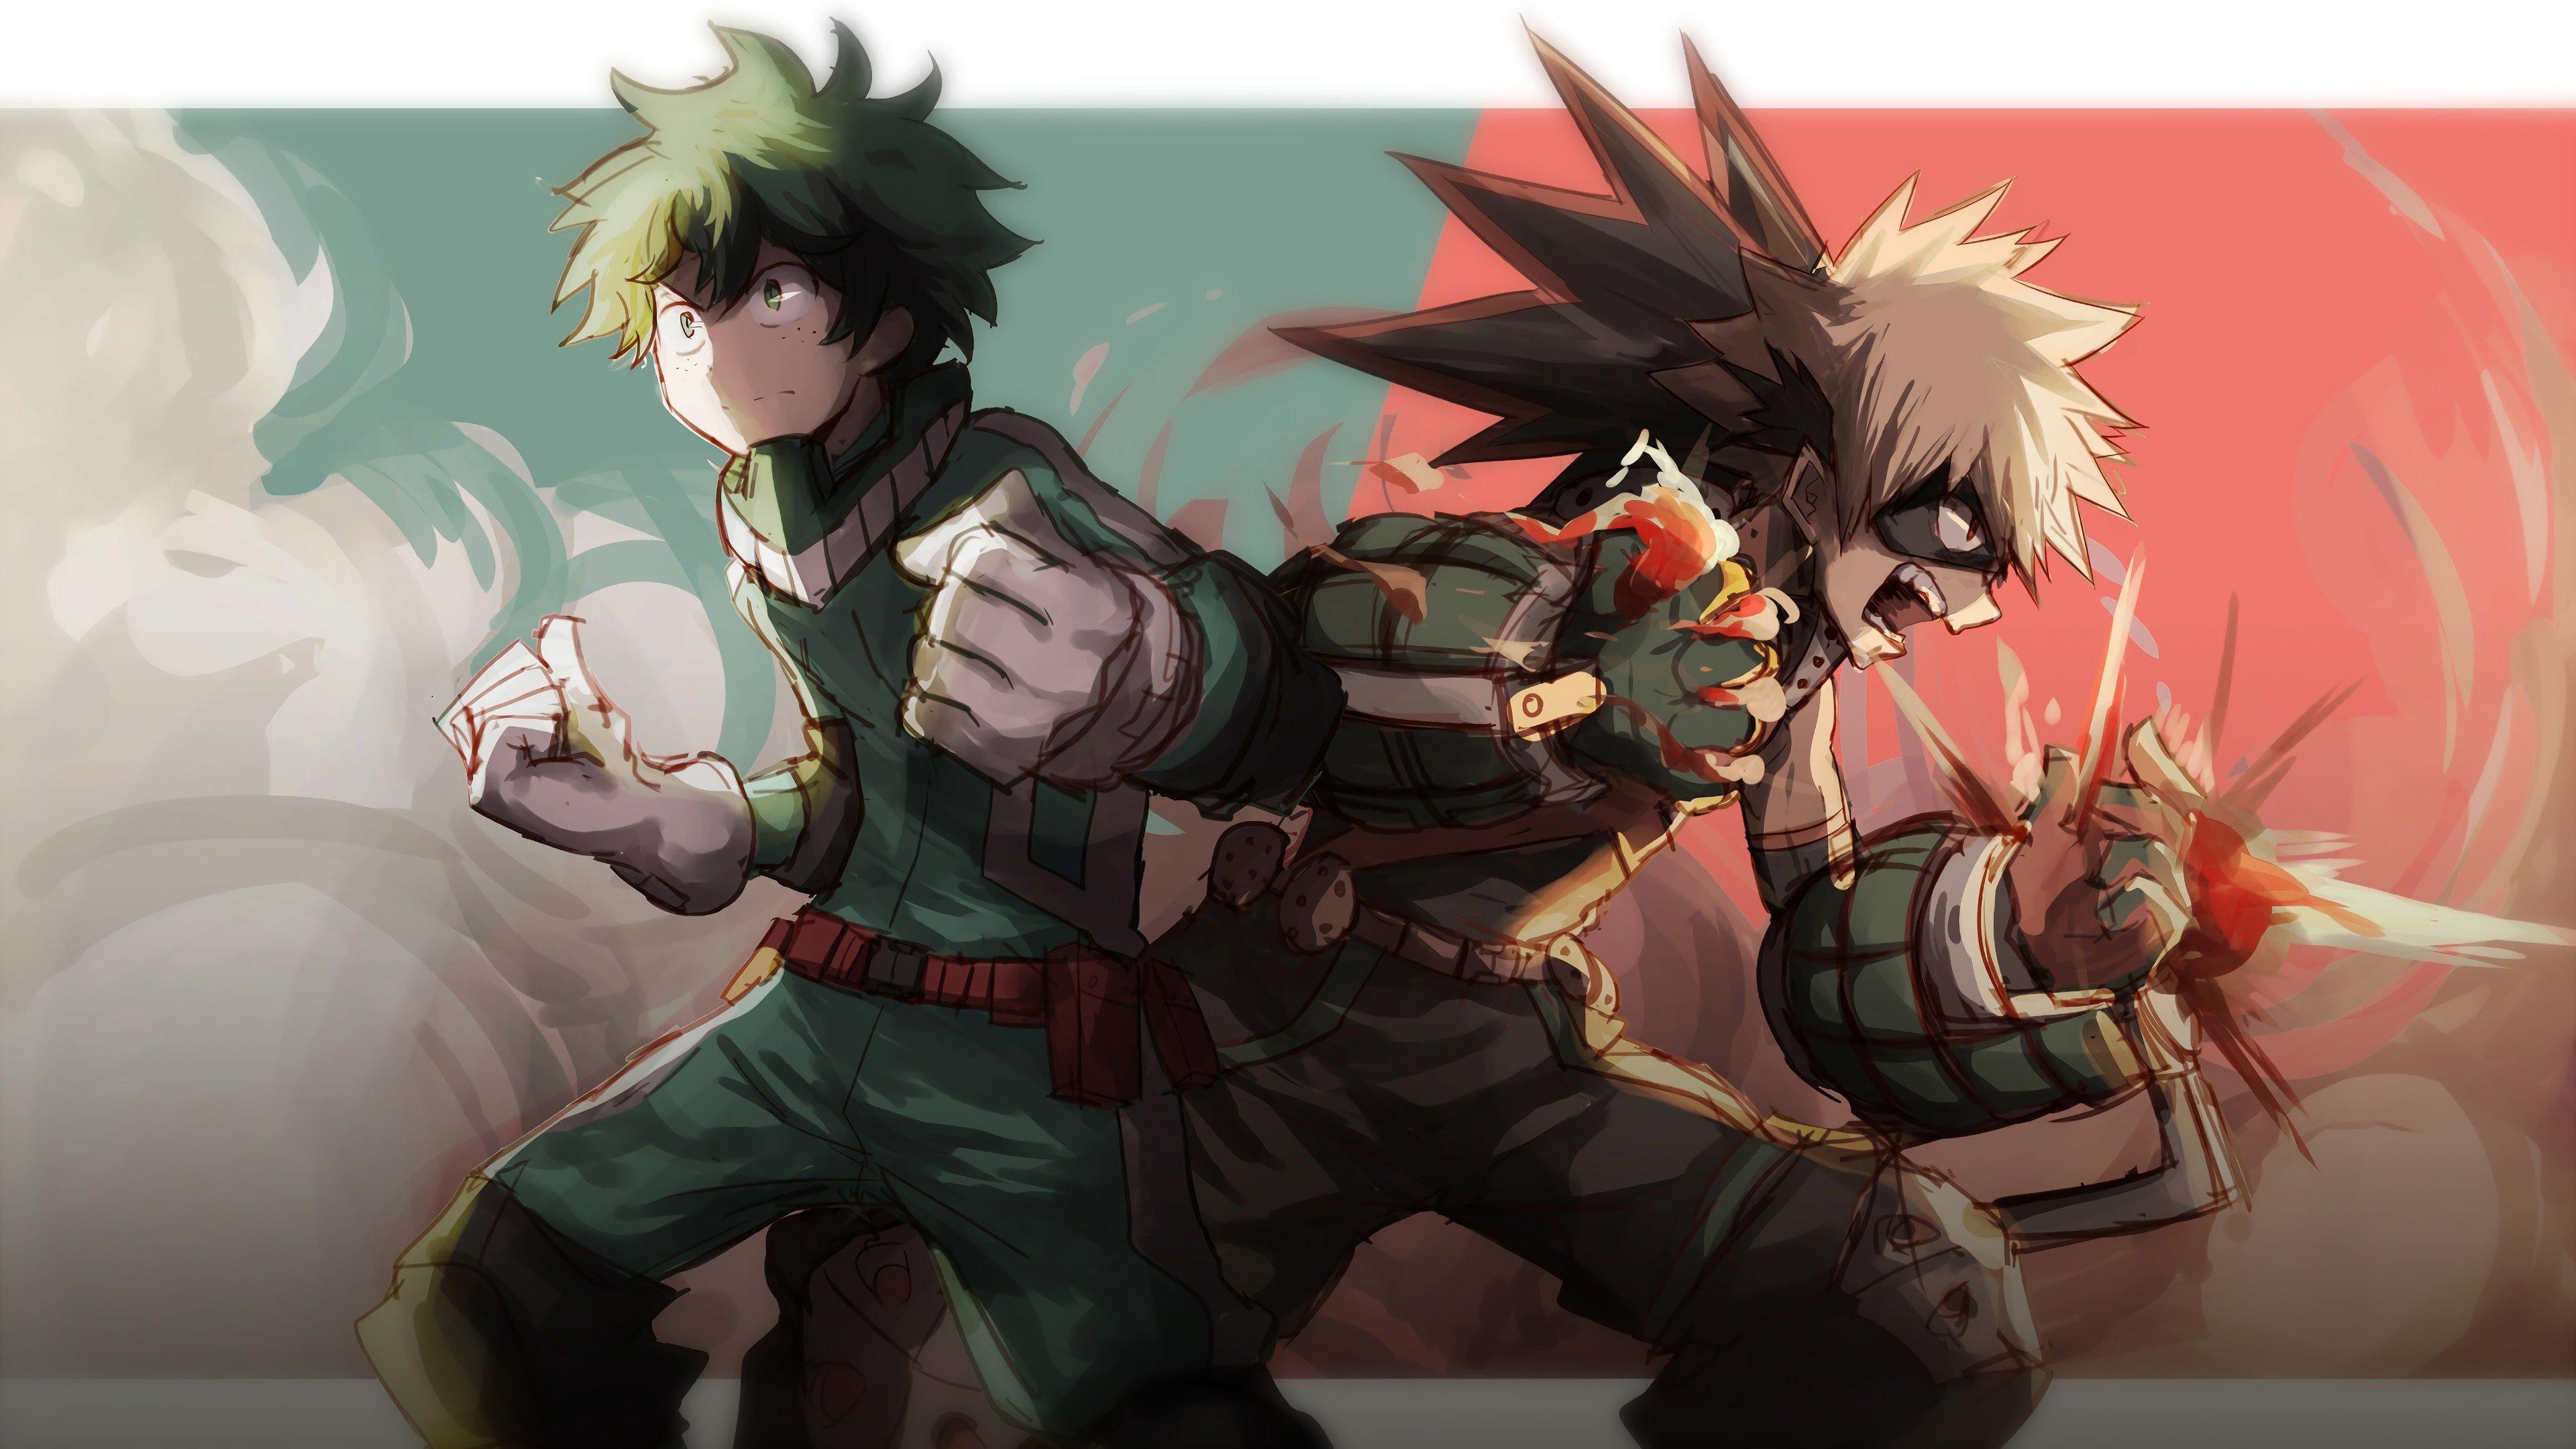 Katsuki Bakugou Y Izuku Midoriya My Hero Academia Anime